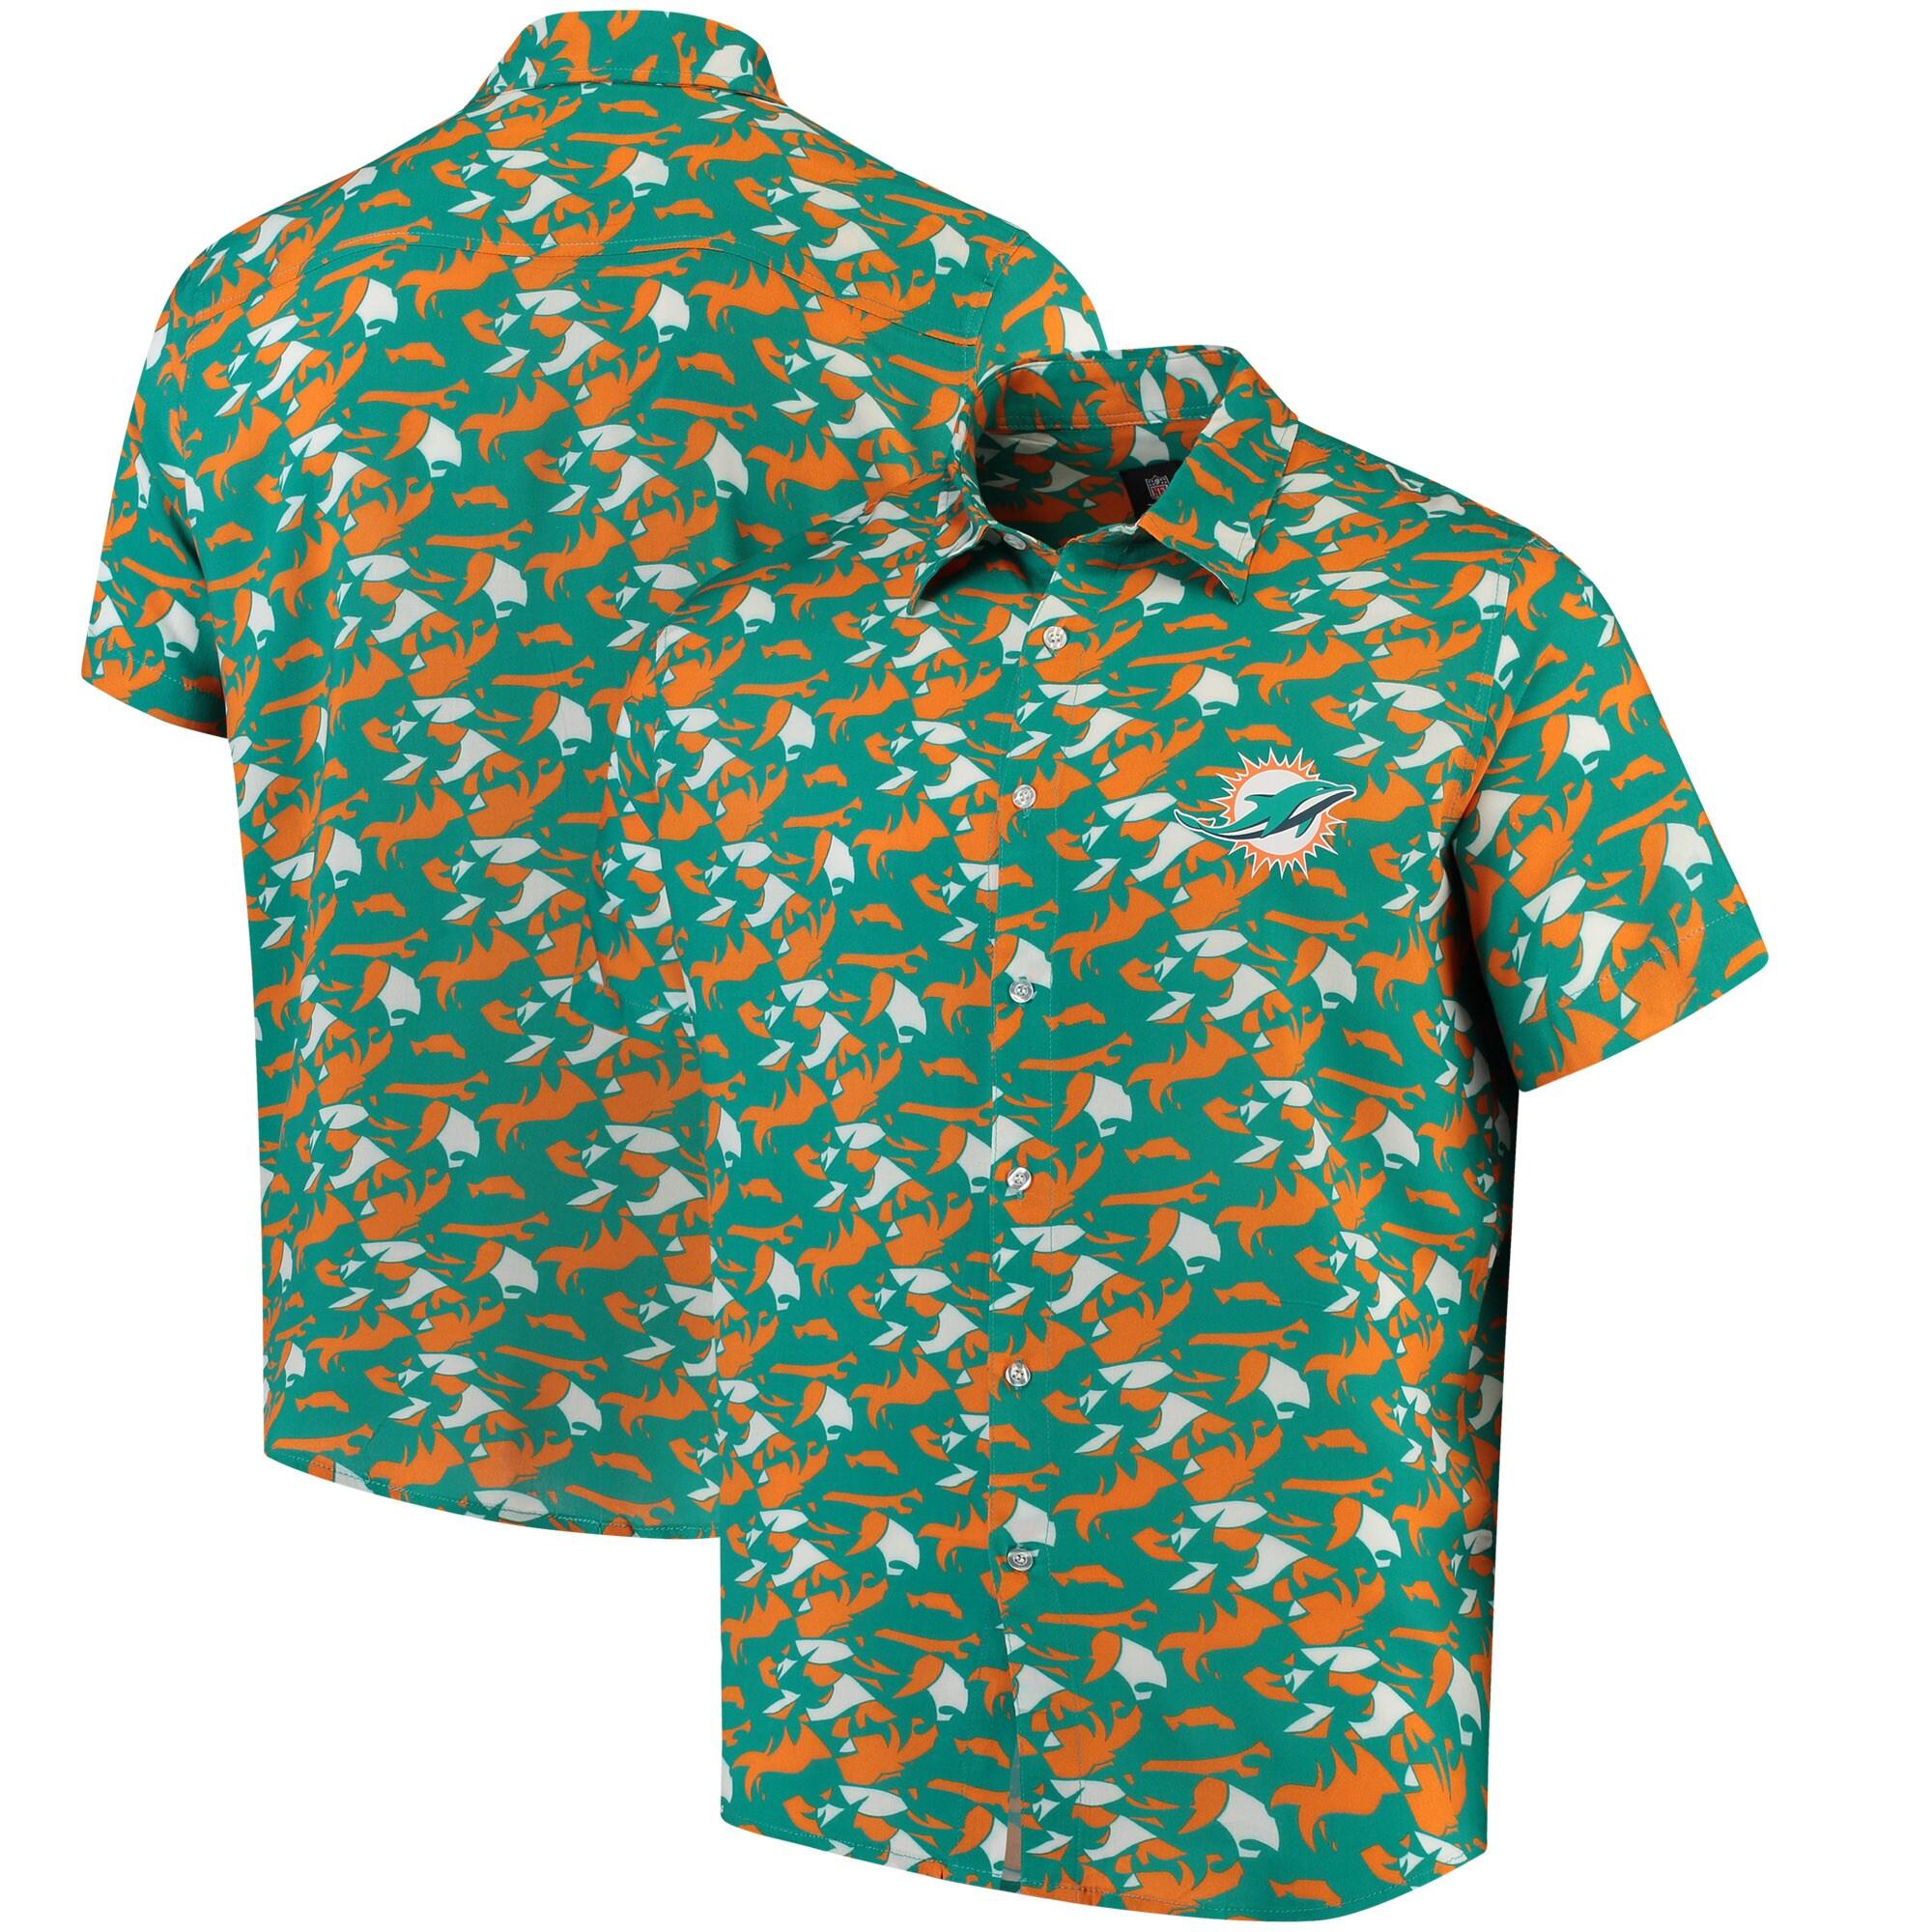 Miami Dolphins NFLxFIT Quicksnap Woven Shirt - Aqua/Orange